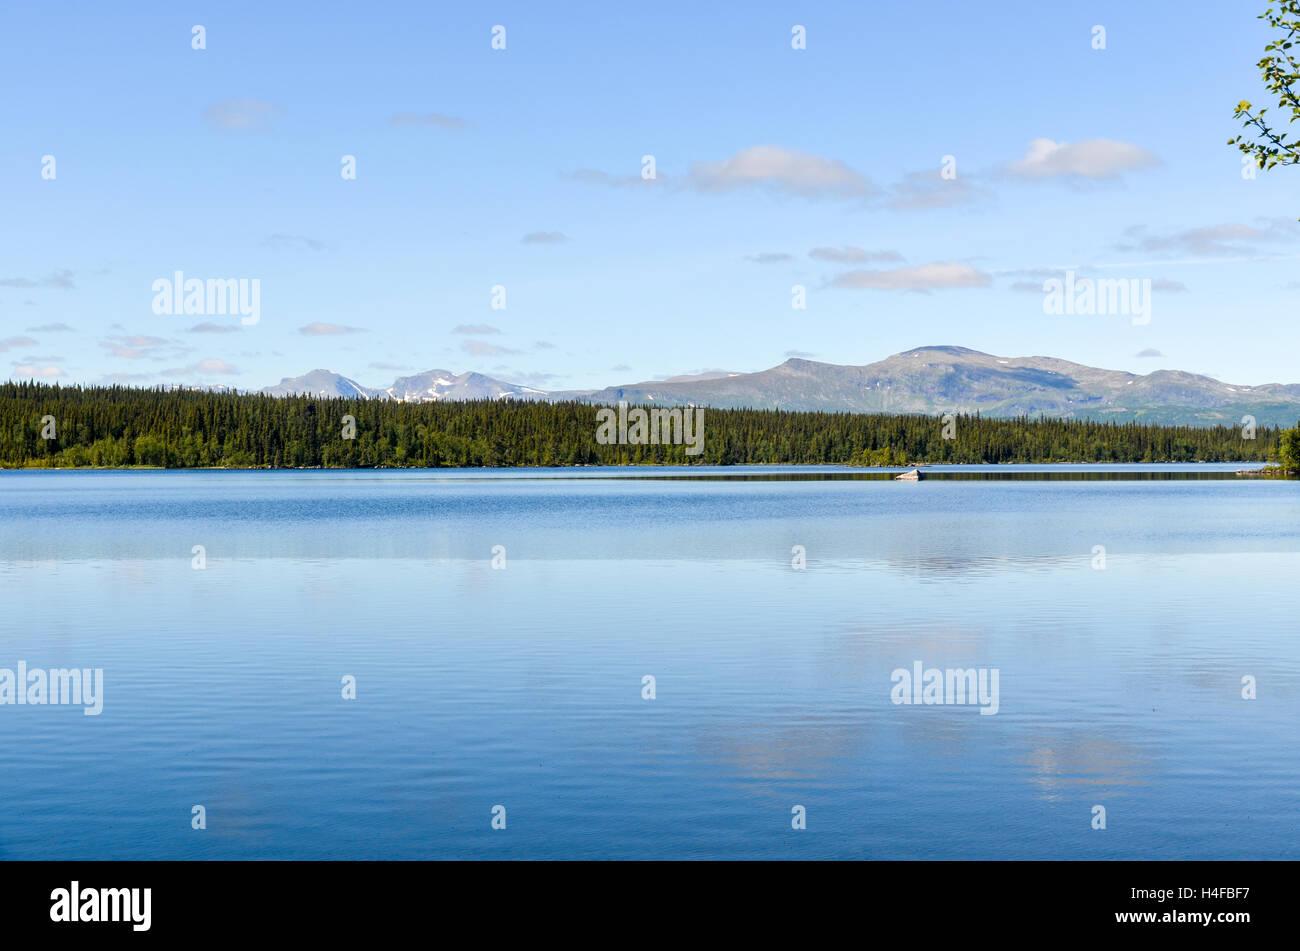 View on Marsfjällen mountain range in northern Sweden - Stock Image